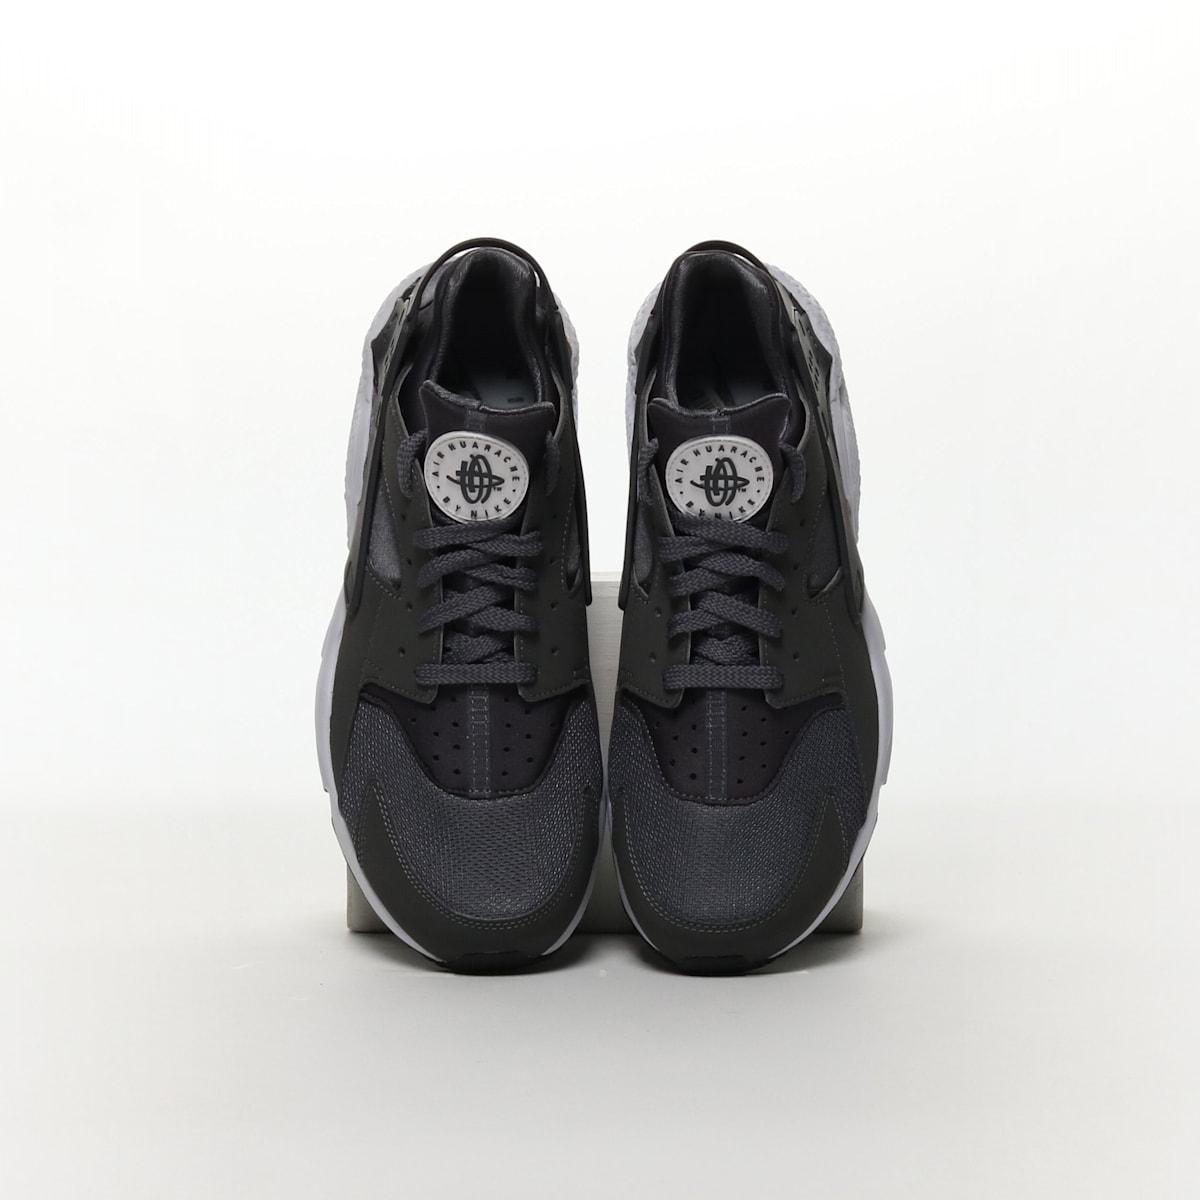 super popular c64de 7ed3a ... Nike air huarache.  Actual Shoe